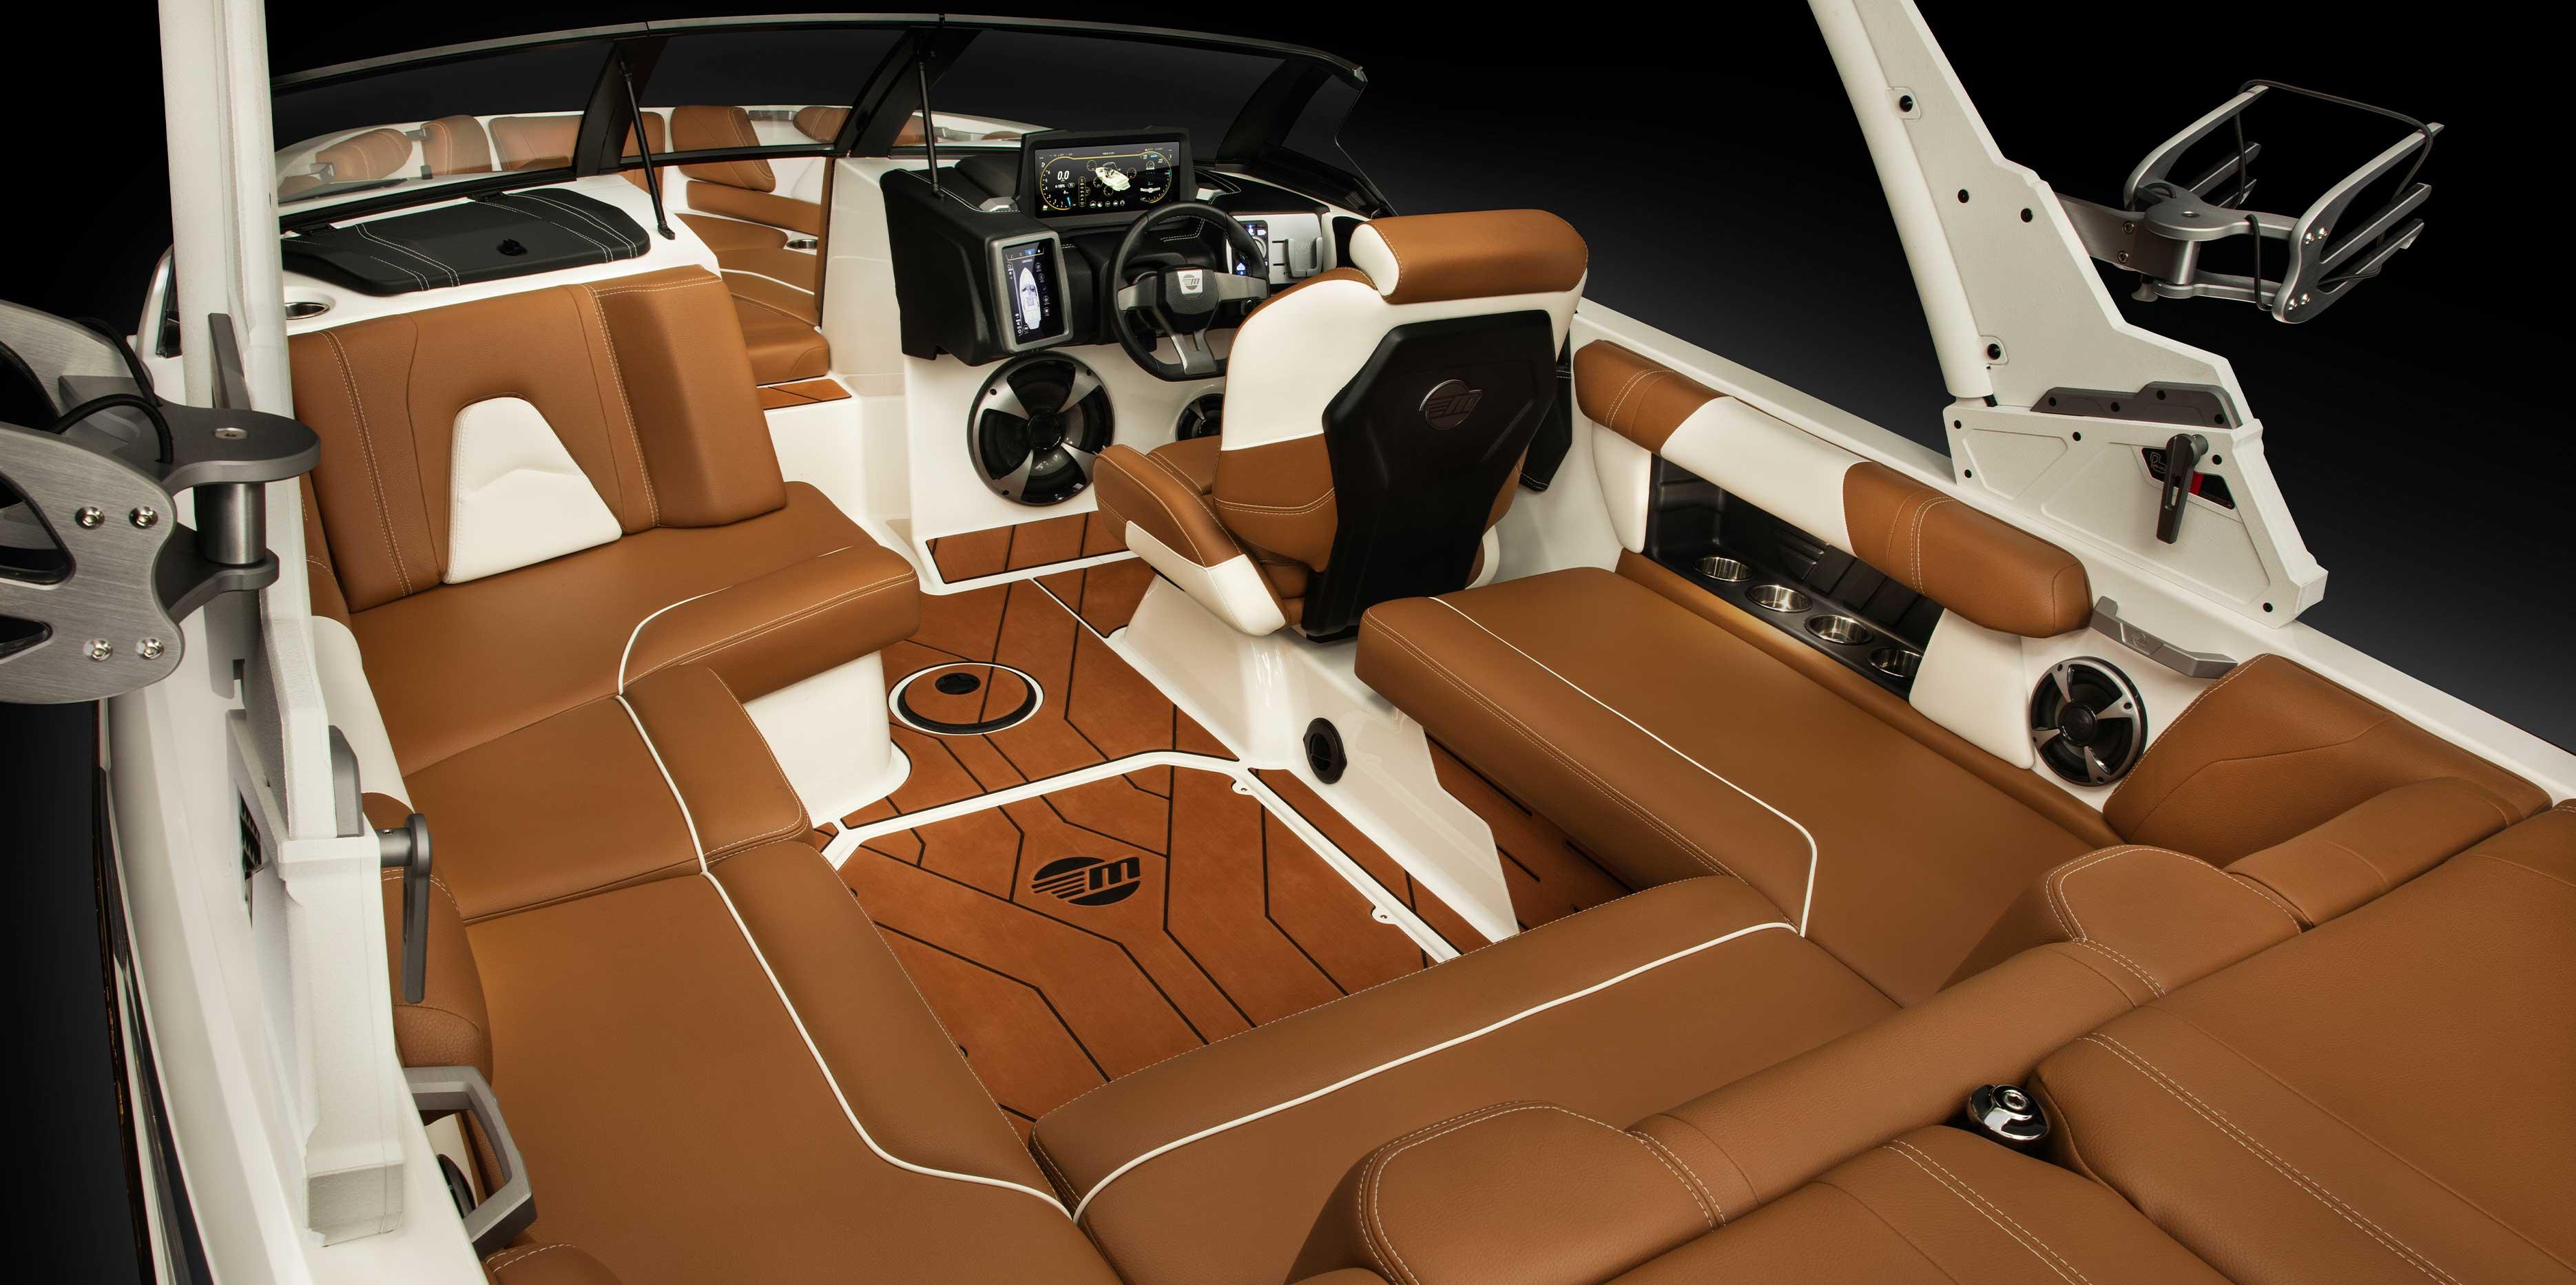 2021 Malibu Boats Wakesetter 21 VLX interior